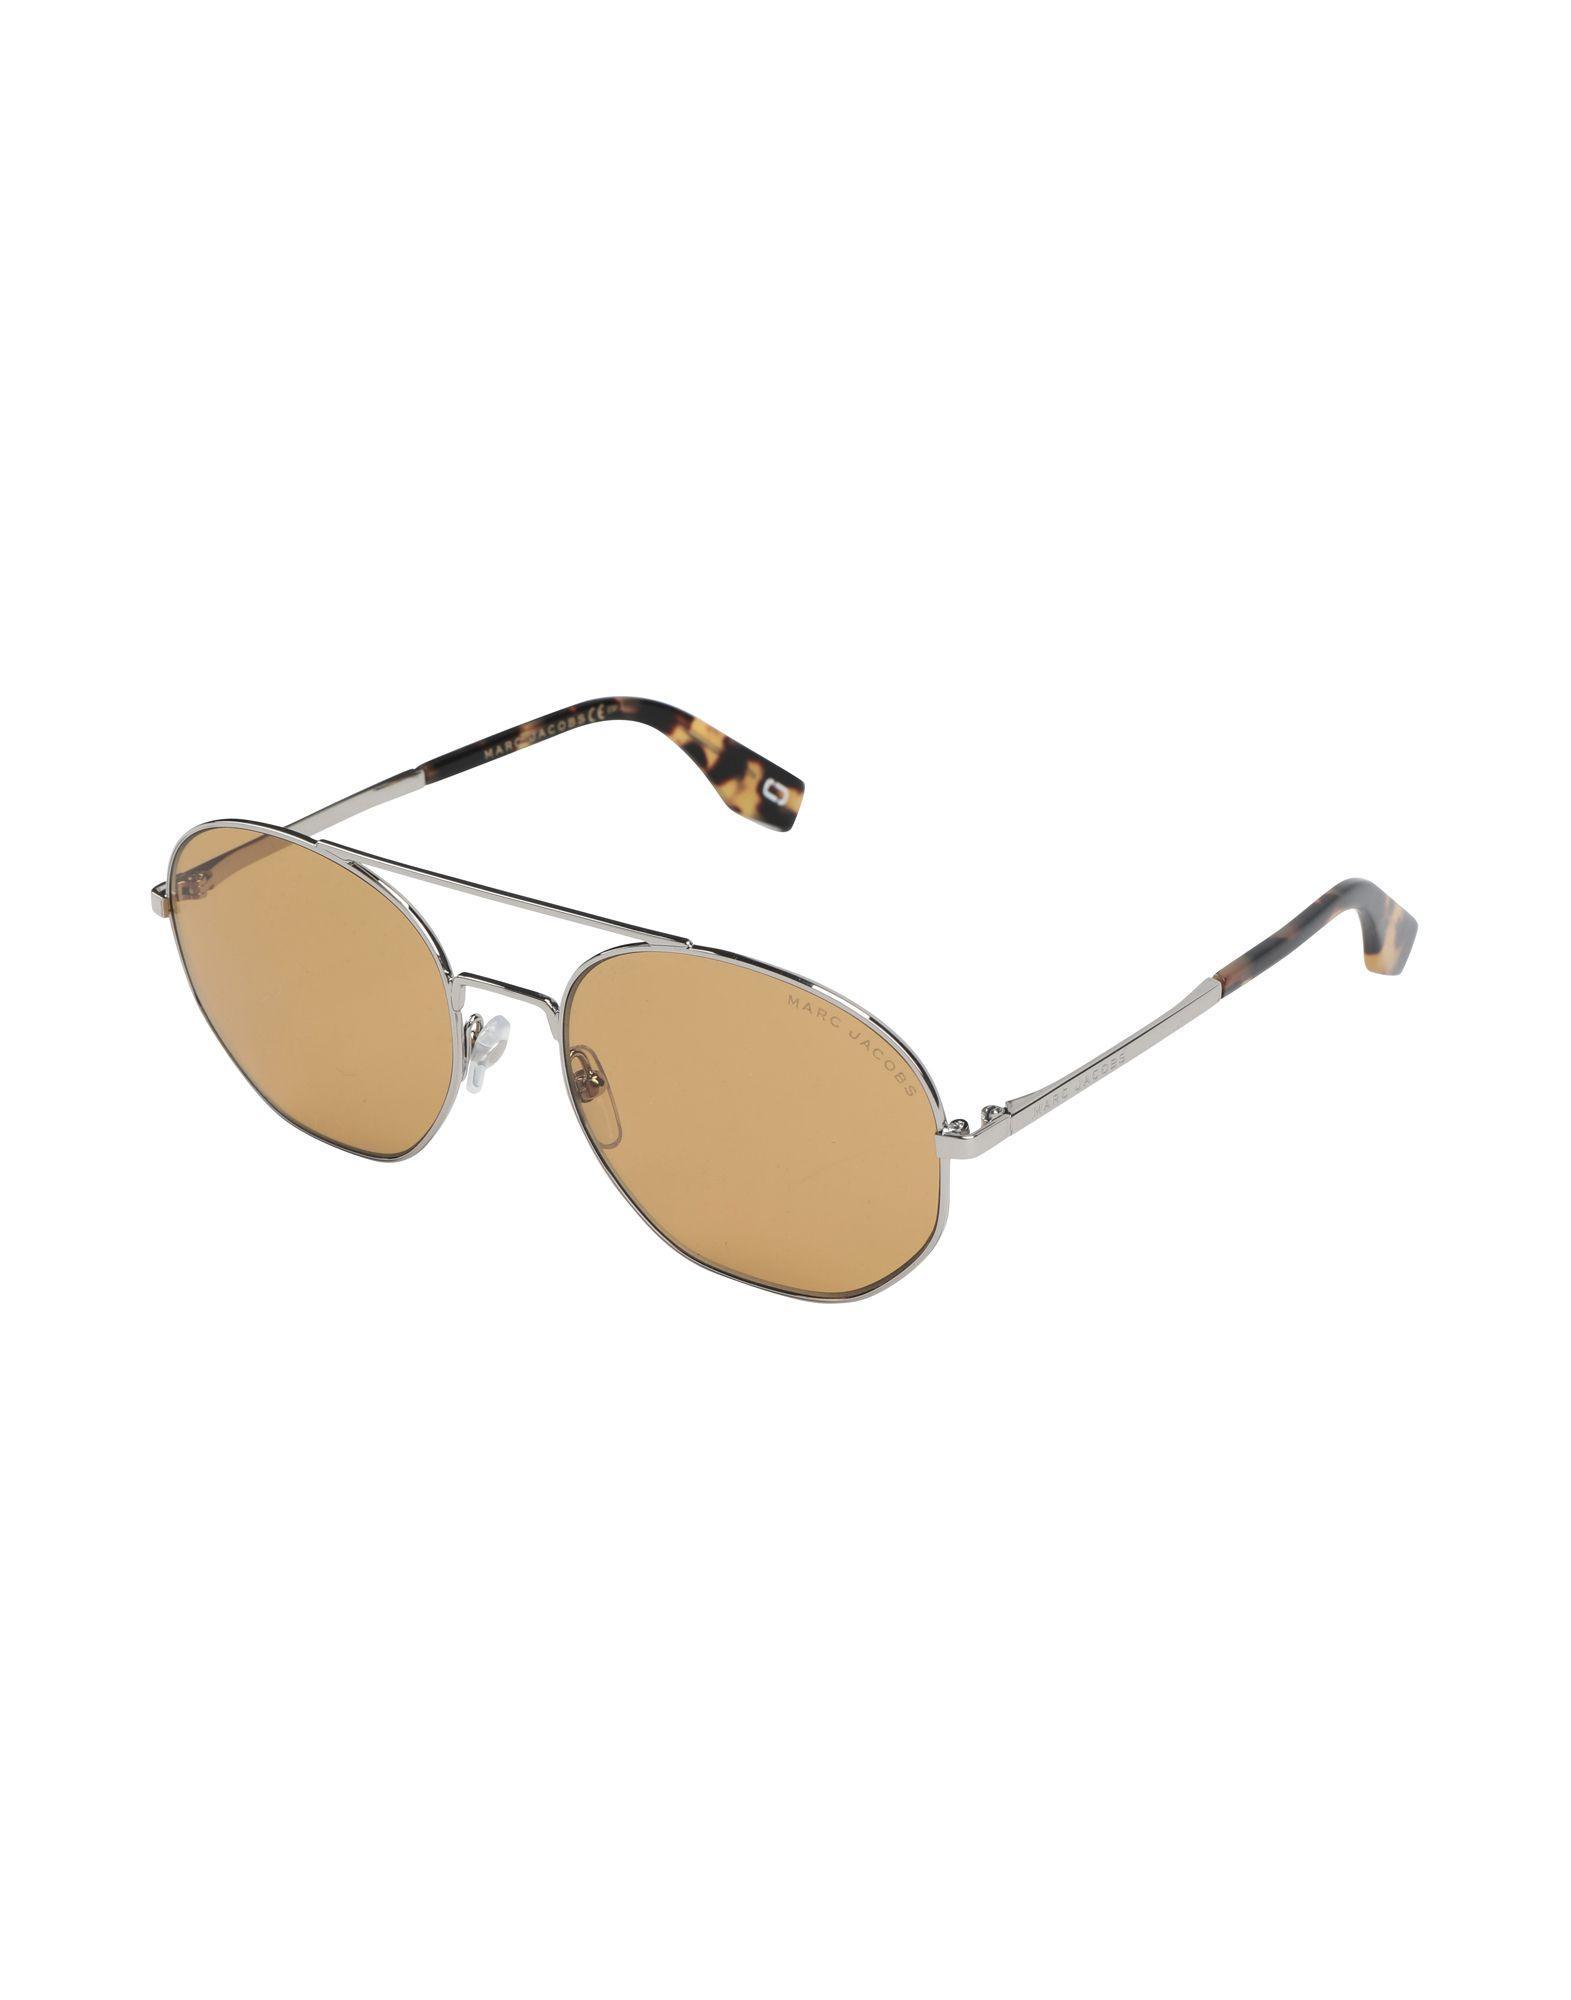 c2d0602ab3 Marc Jacobs. Gafas de sol de mujer de color metálico